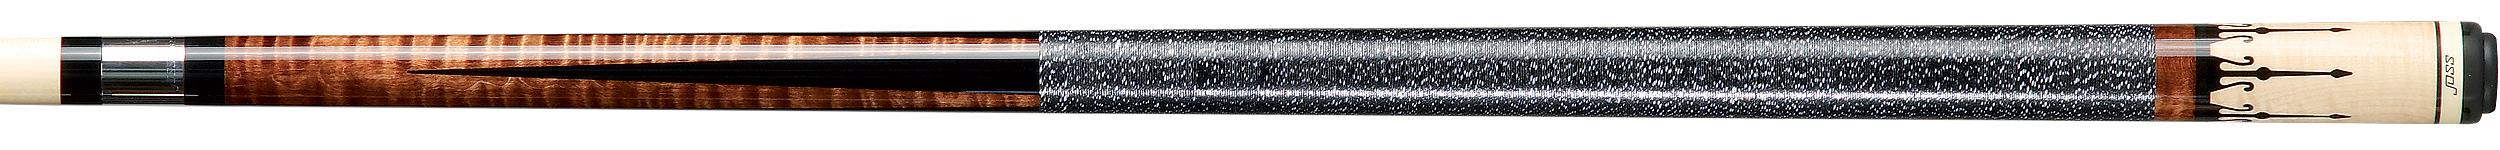 10864-bb-4-piljardikii